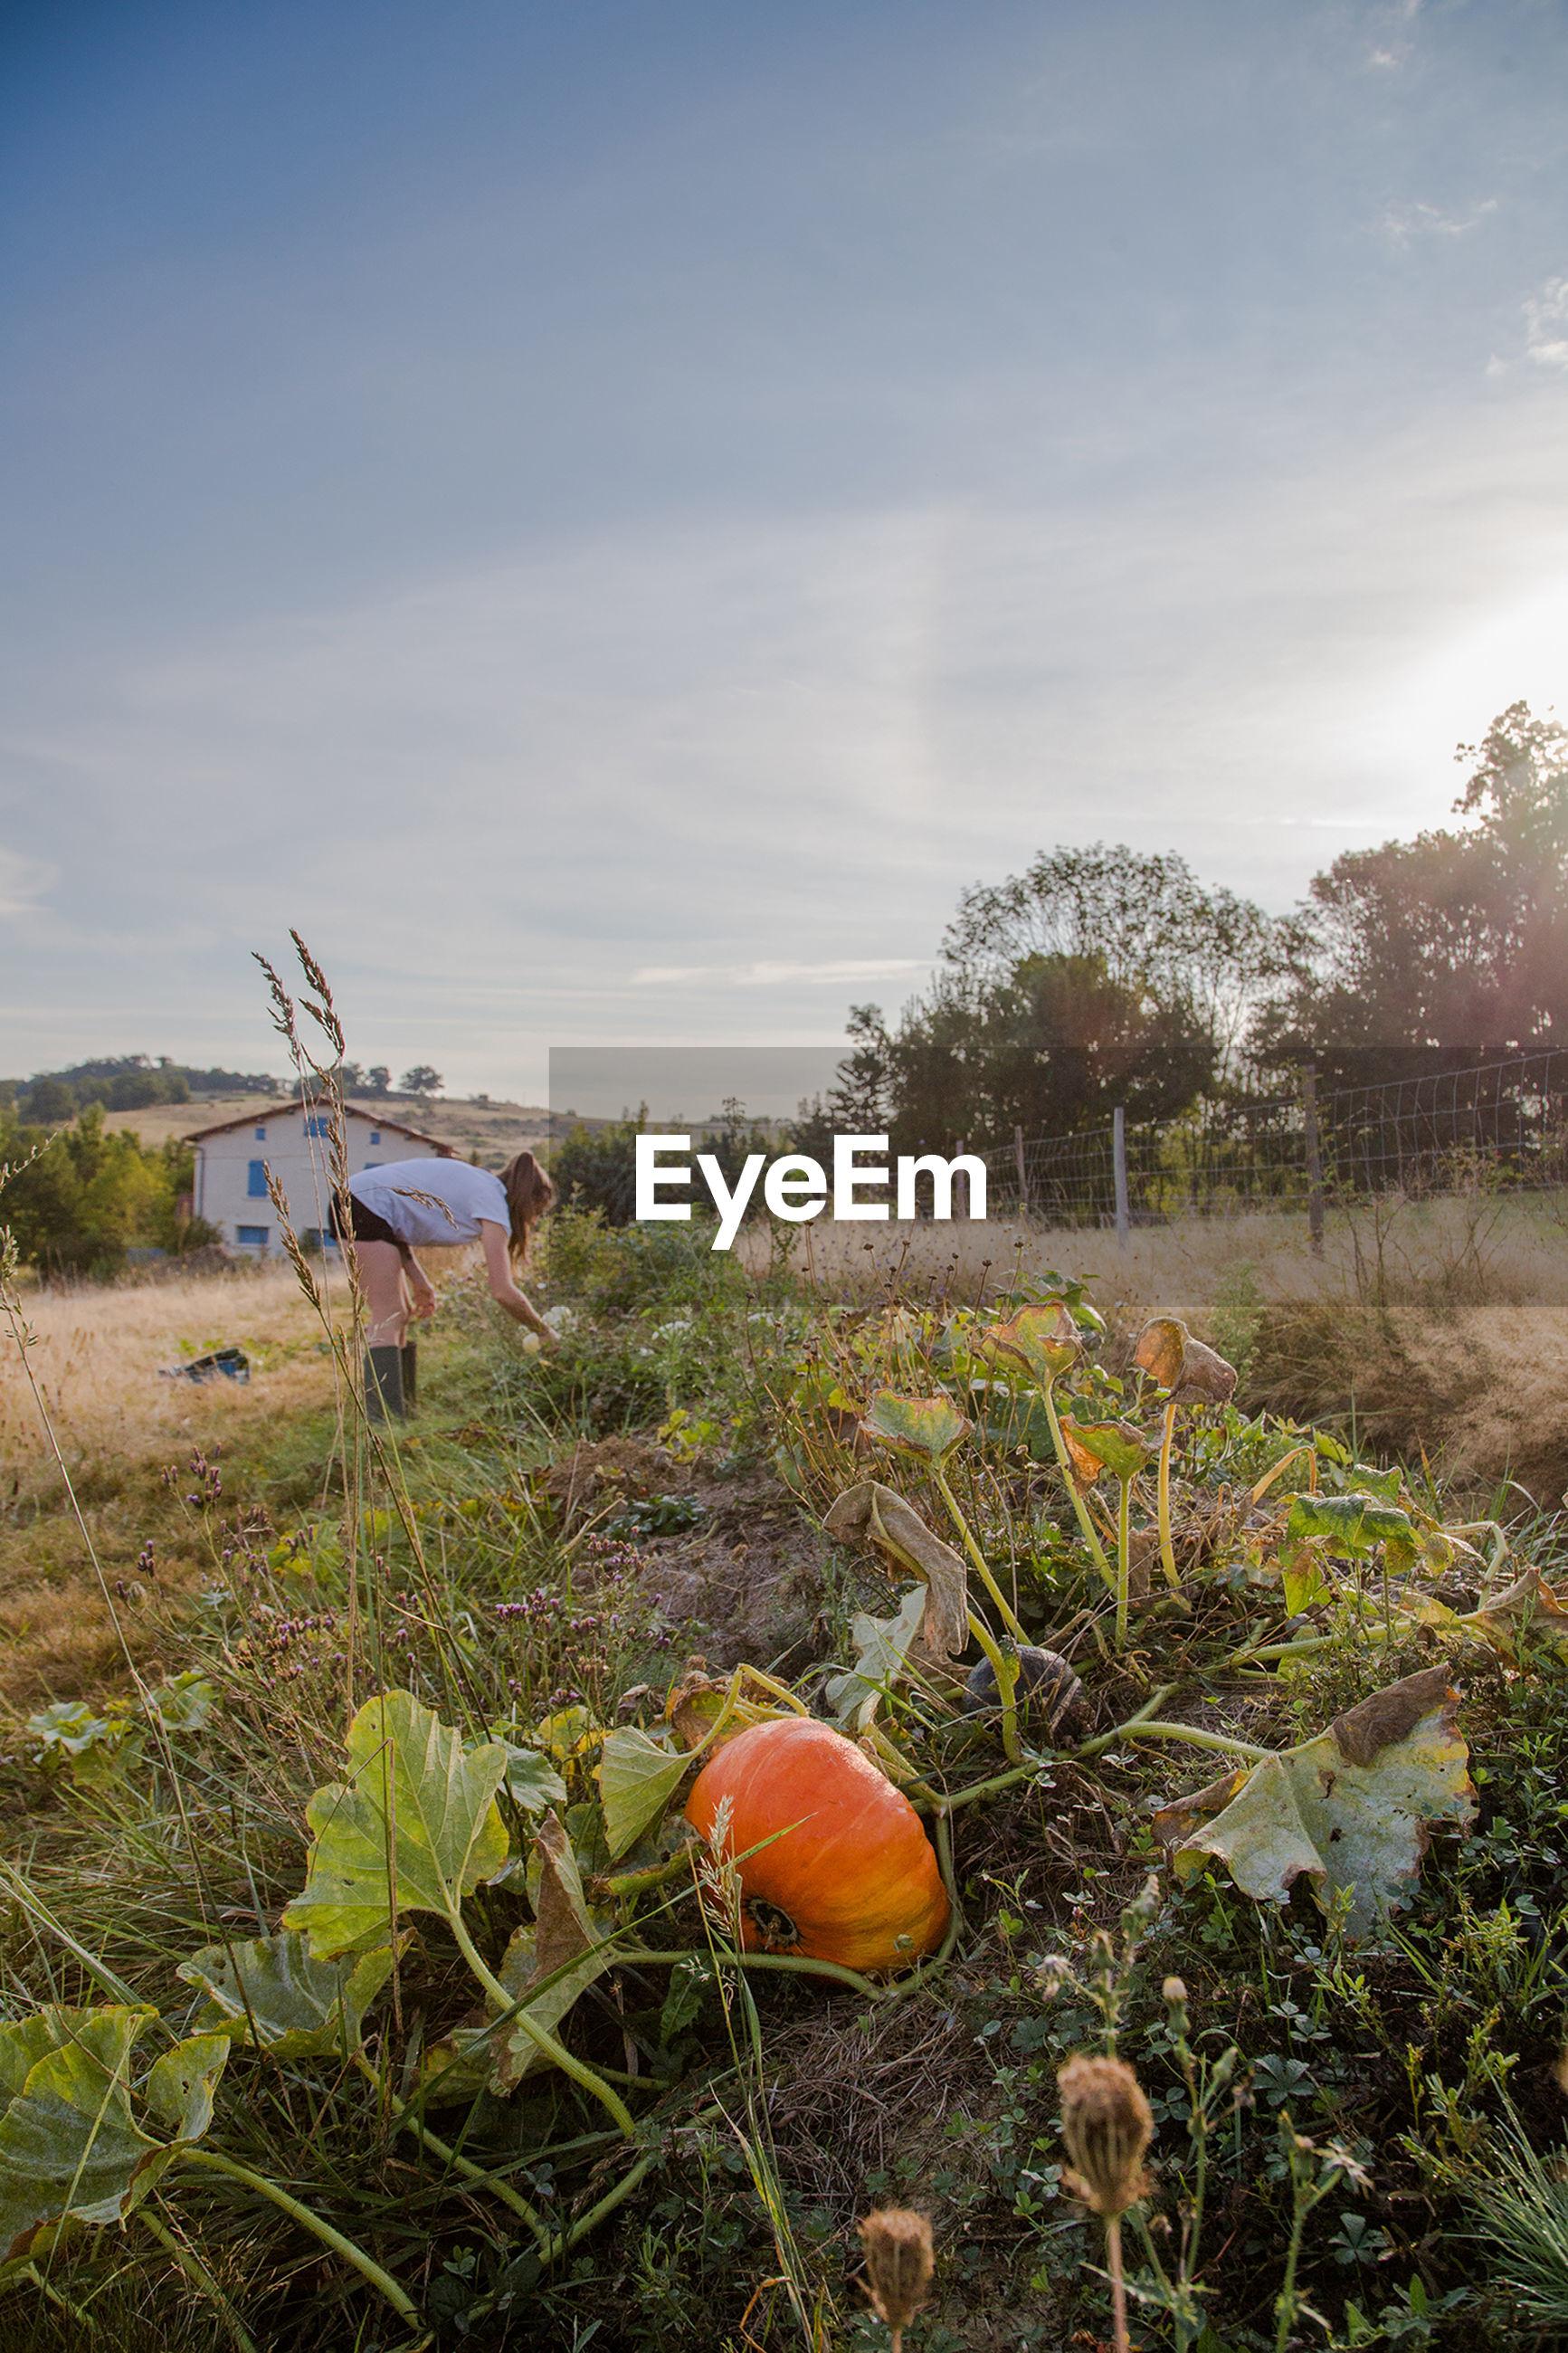 VIEW OF PUMPKINS IN FIELD